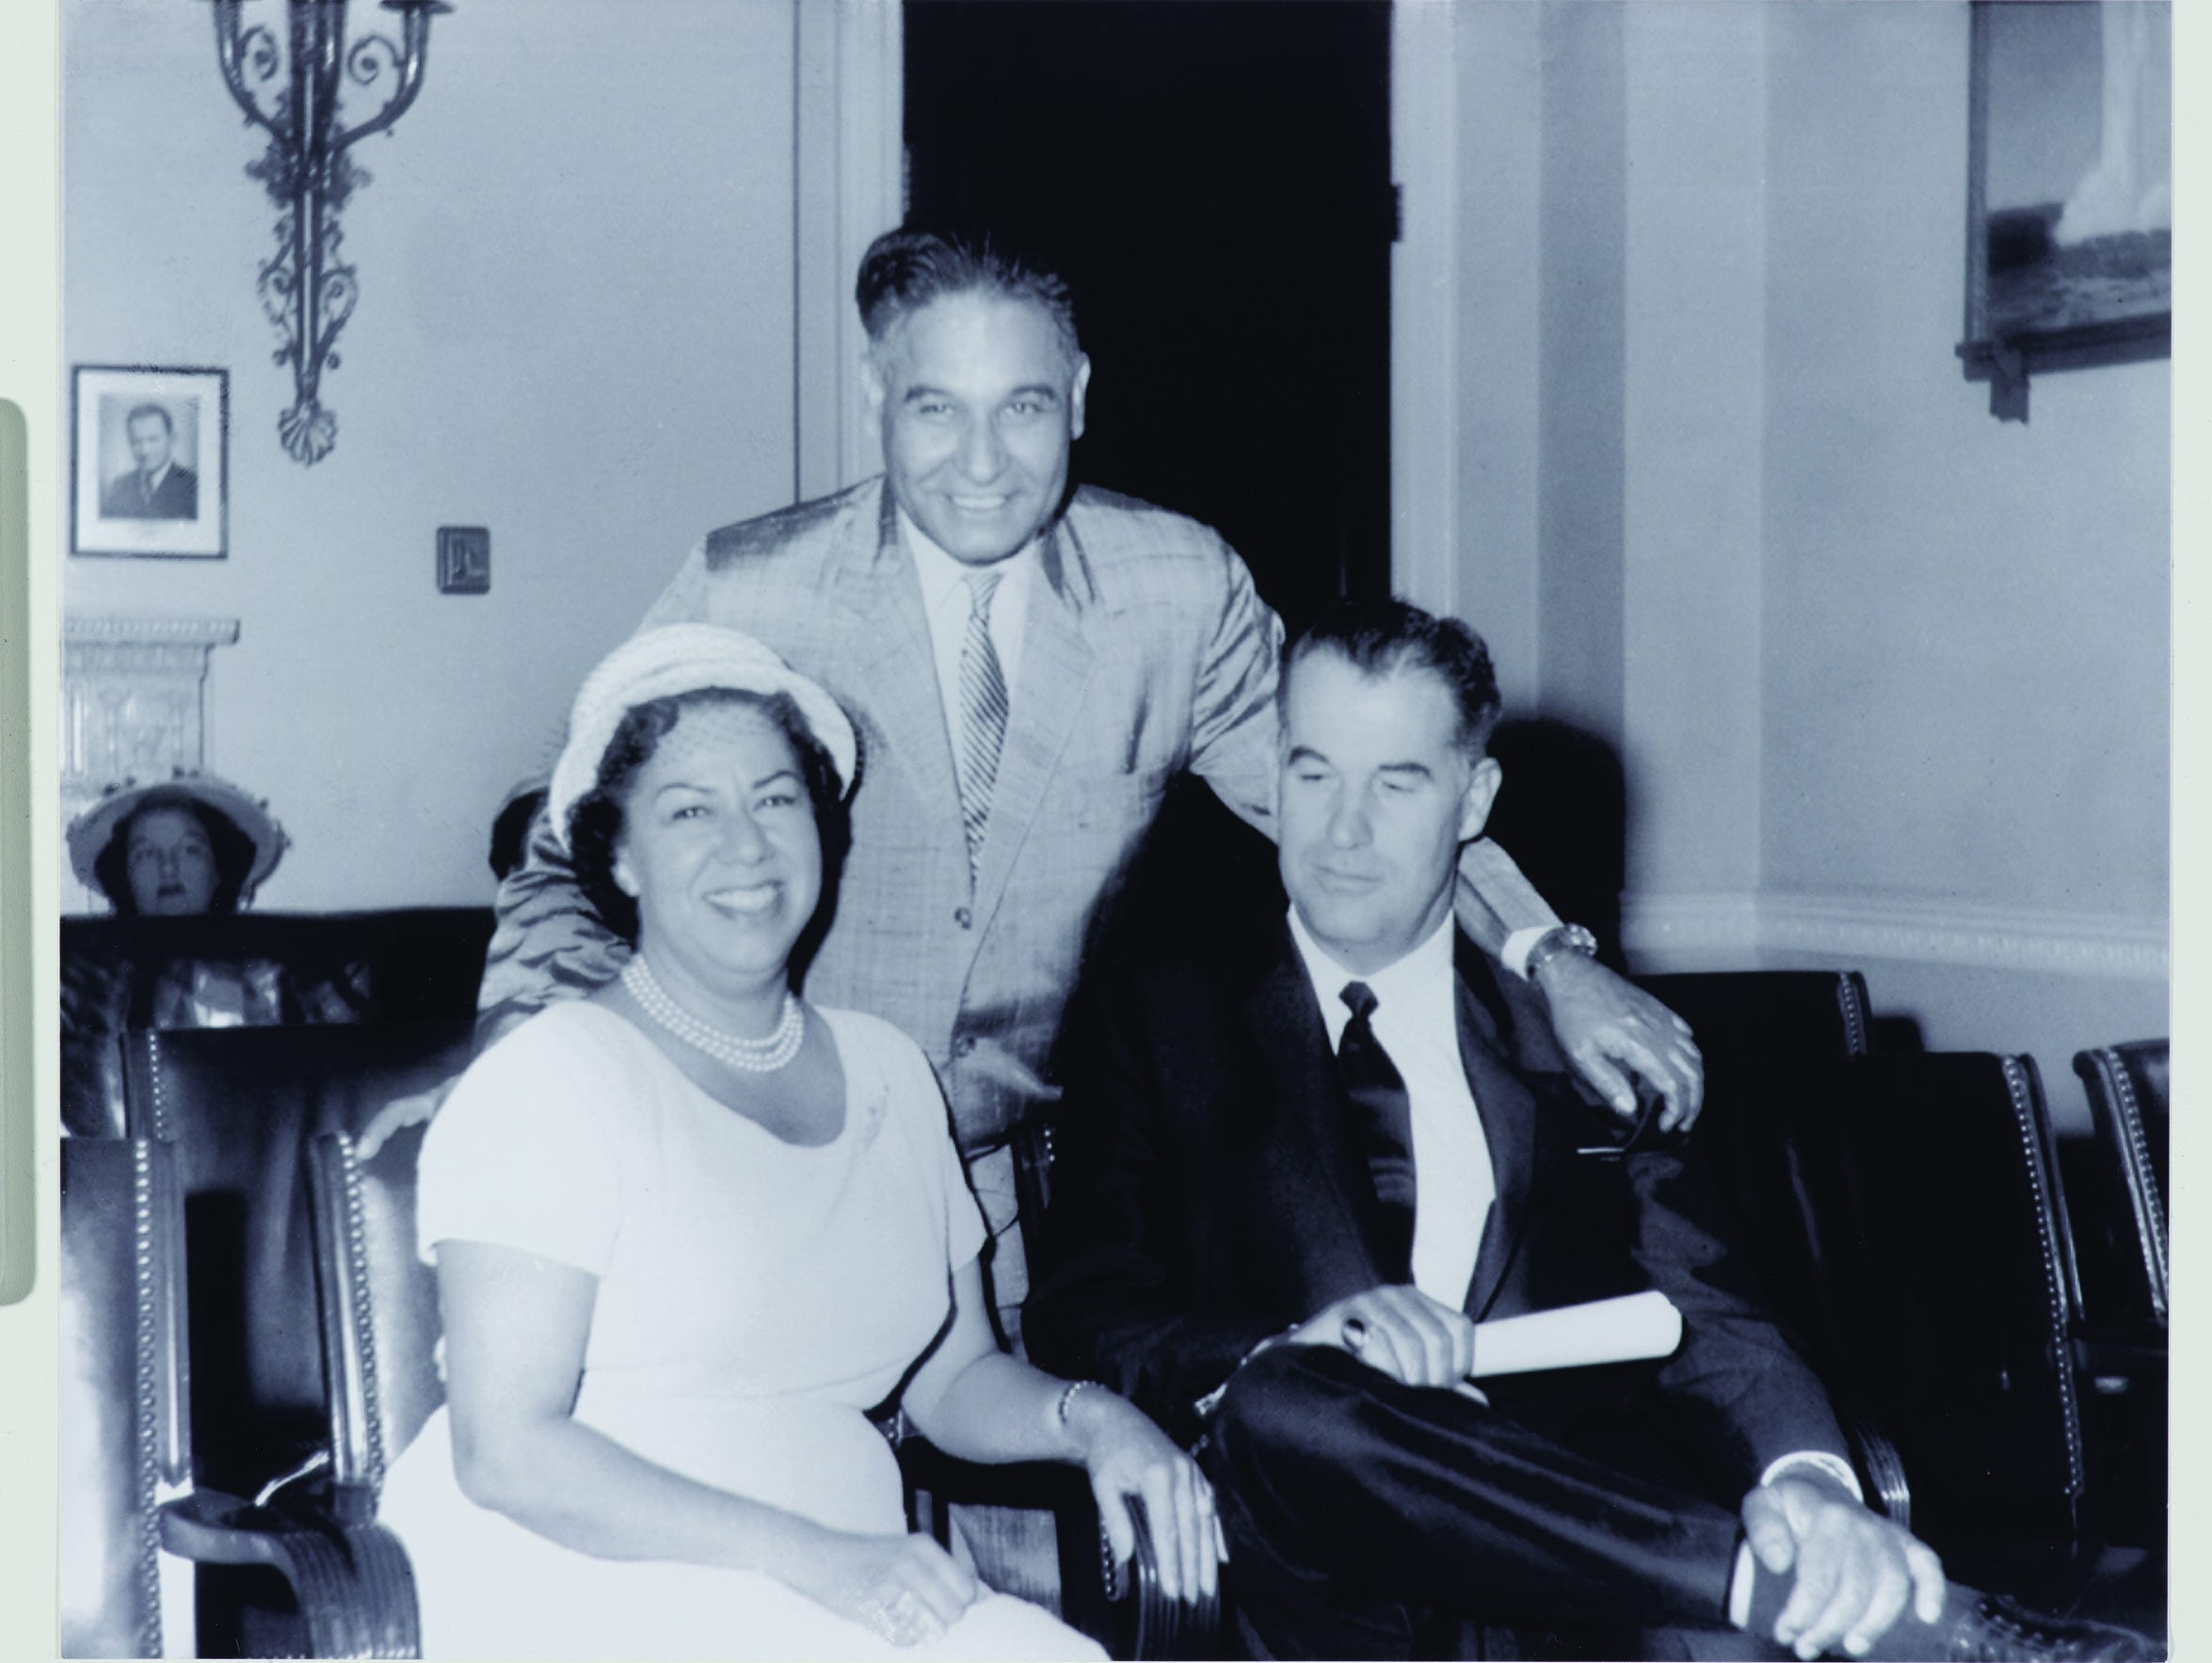 Vyola Ortner in Washington, D.C., with congressman